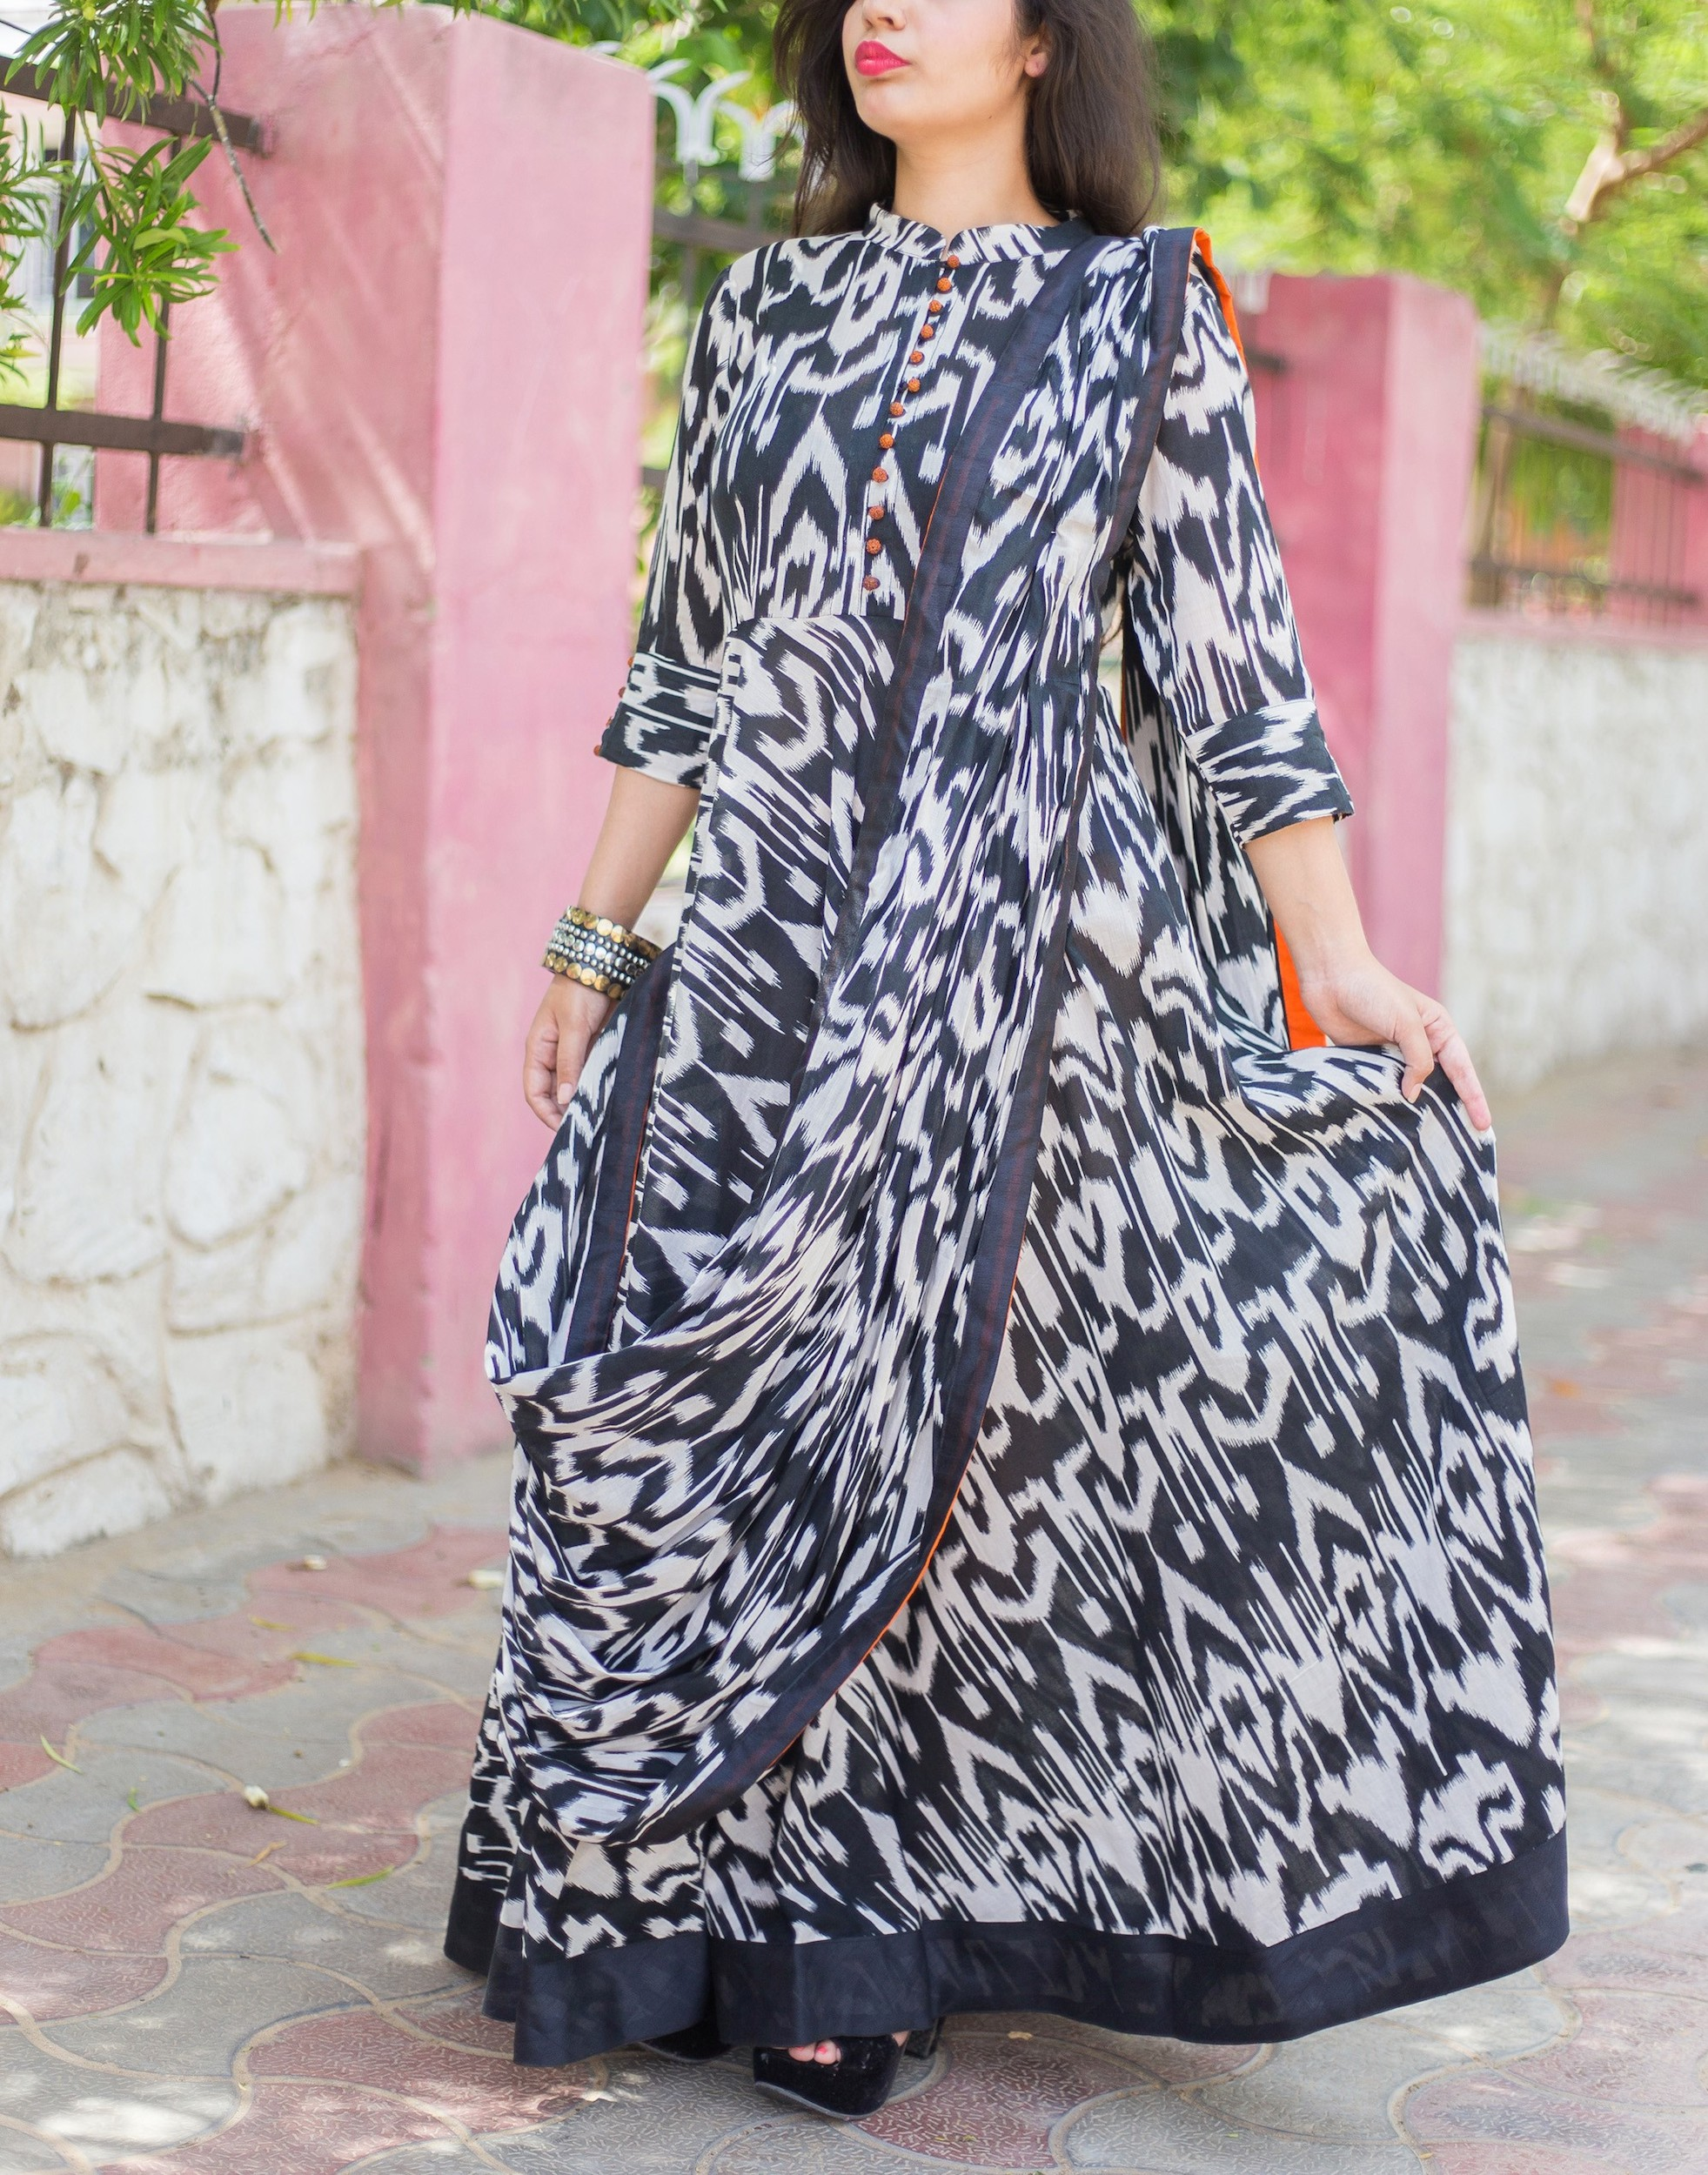 Monochrome drape dress